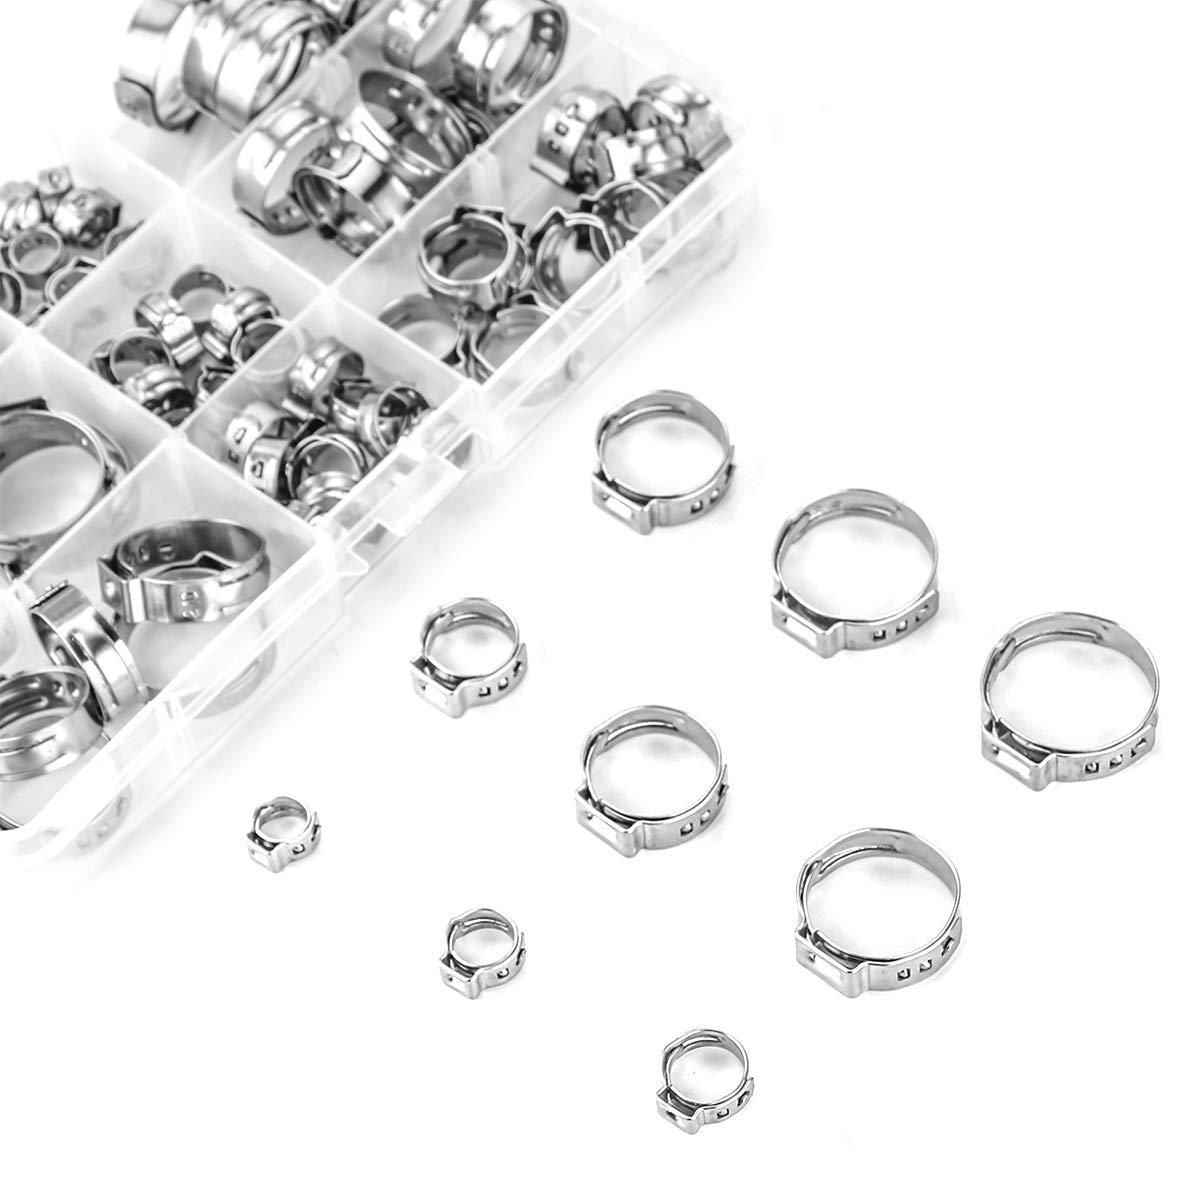 Edelstahl Einzigen Ohr Schlauch Klemme, 80Pcs 6-23,6mm Crimp Schlauch Clamp Sortiment Kit Ohr Stufenlose Cinch Ringe Crimp Prise Fit